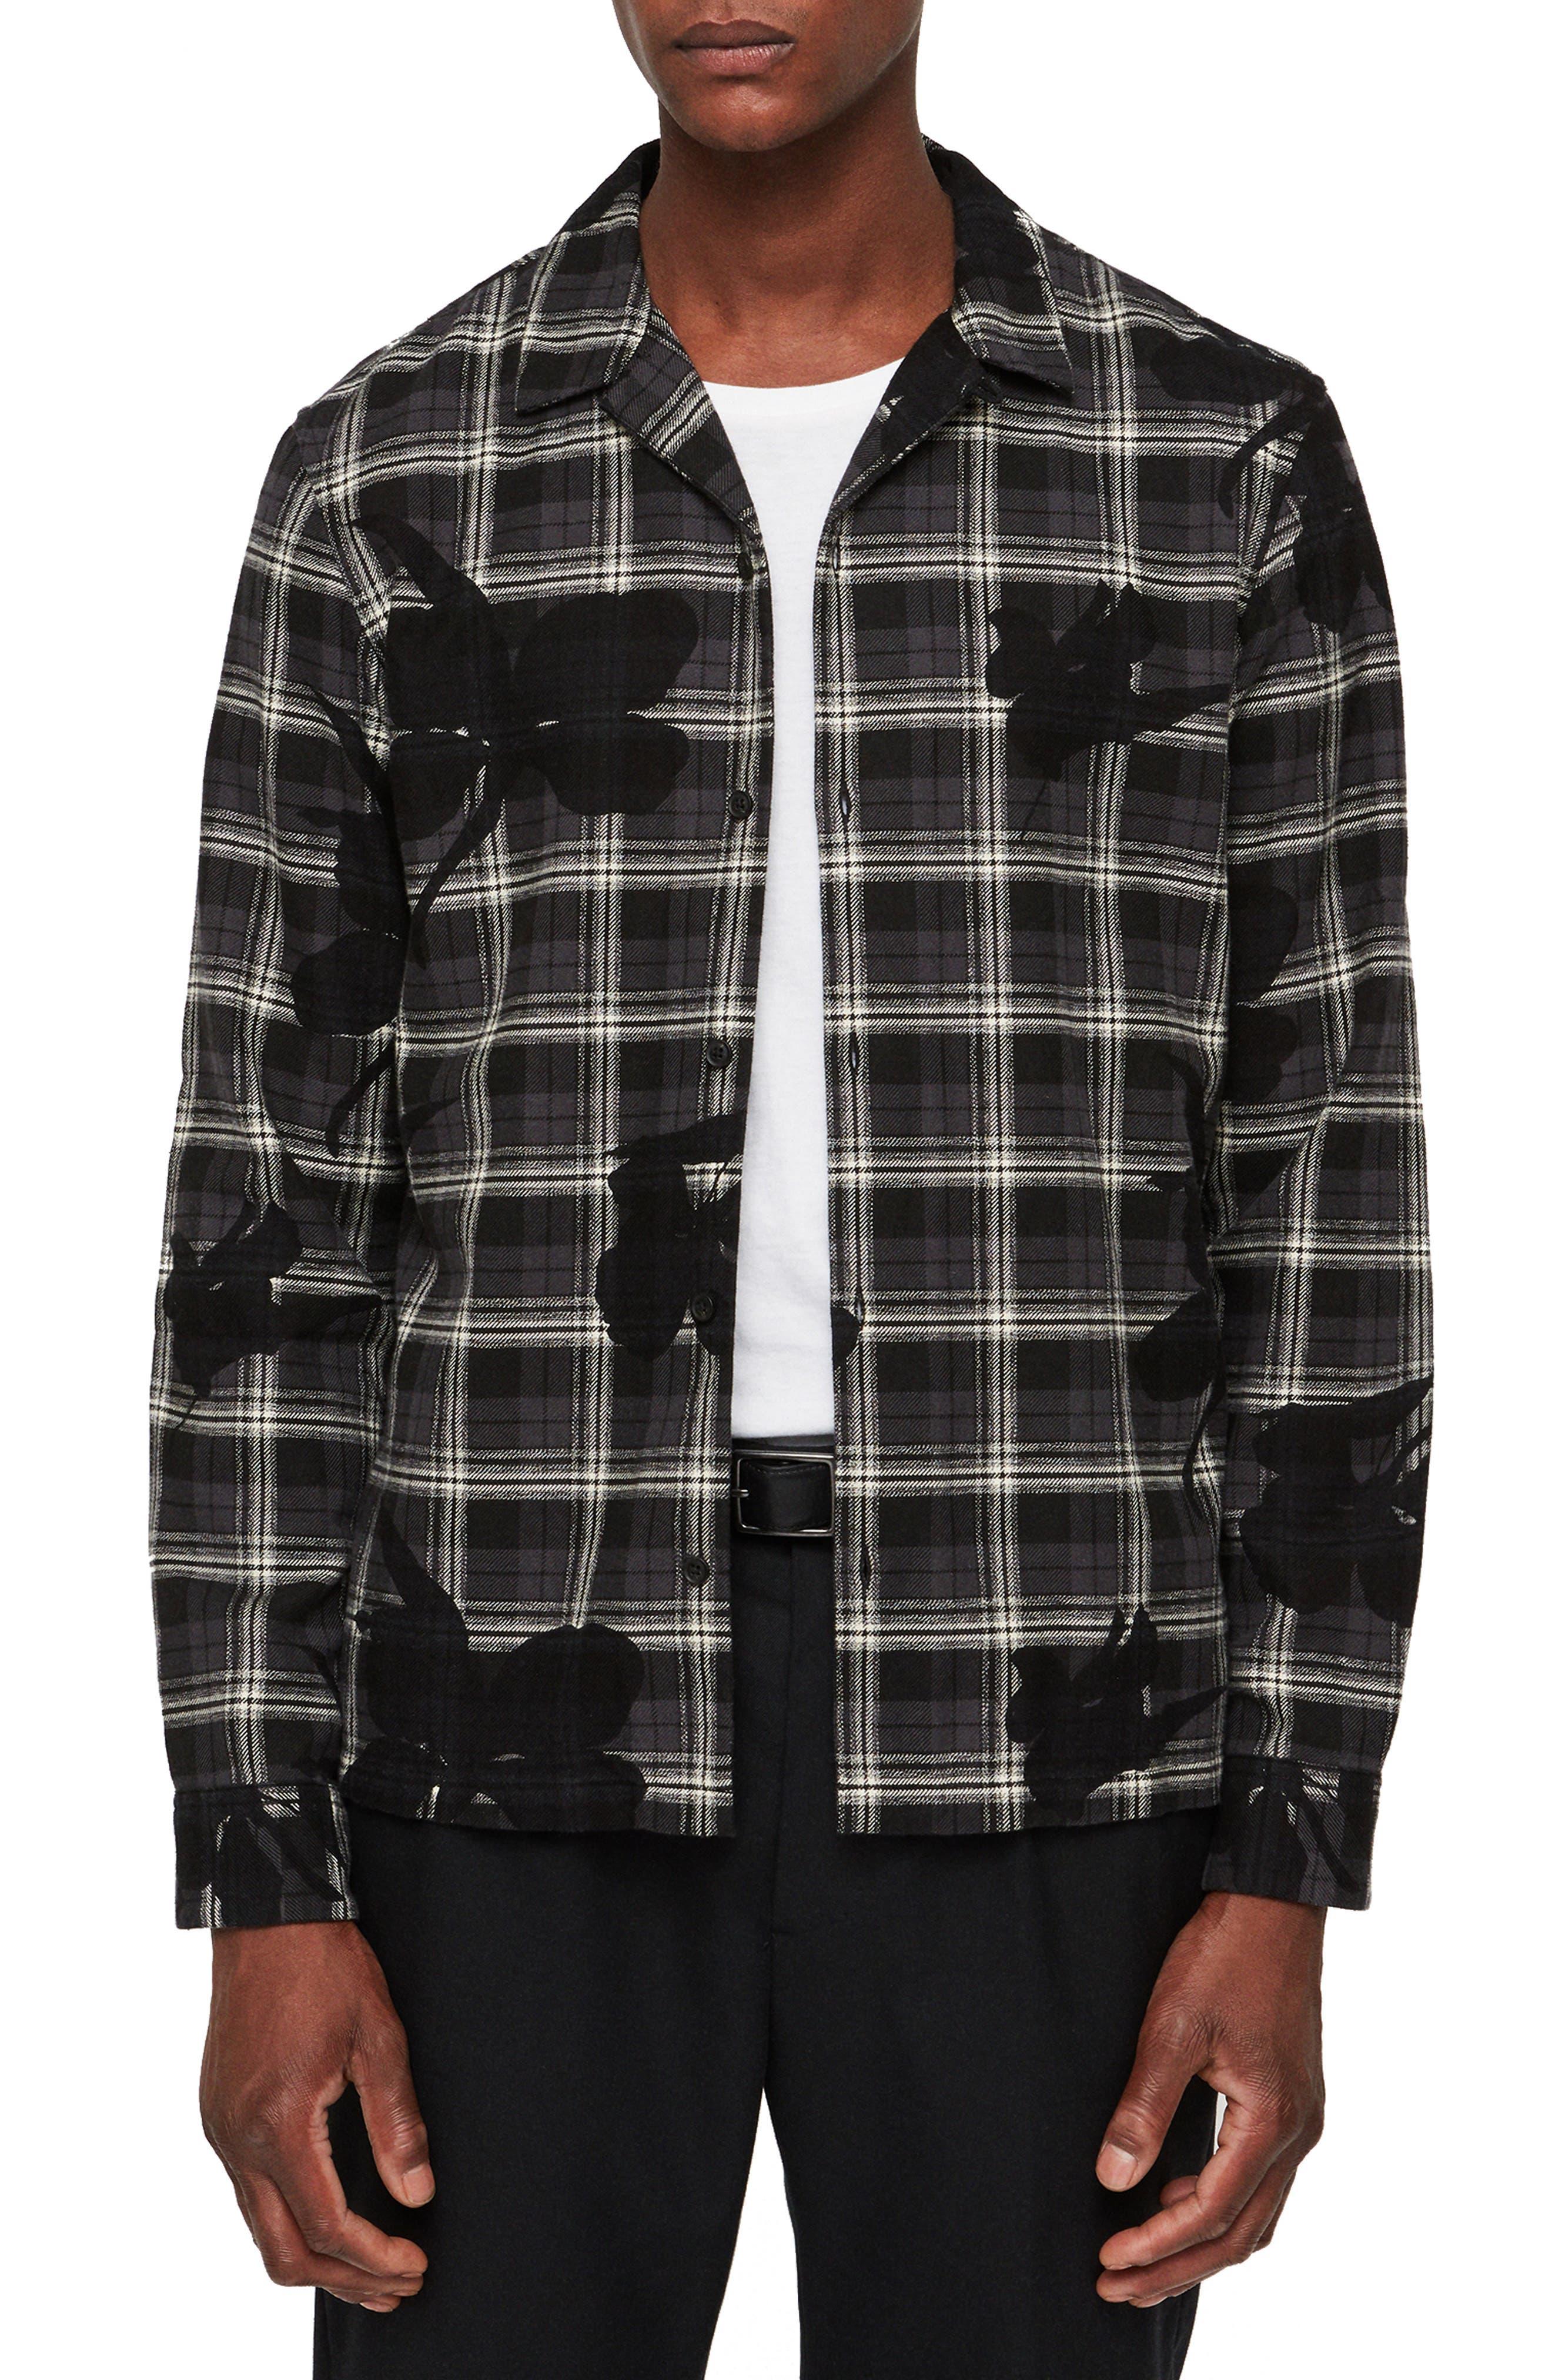 Lilyplaid Slim Fit Flannel Shirt,                             Main thumbnail 1, color,                             001